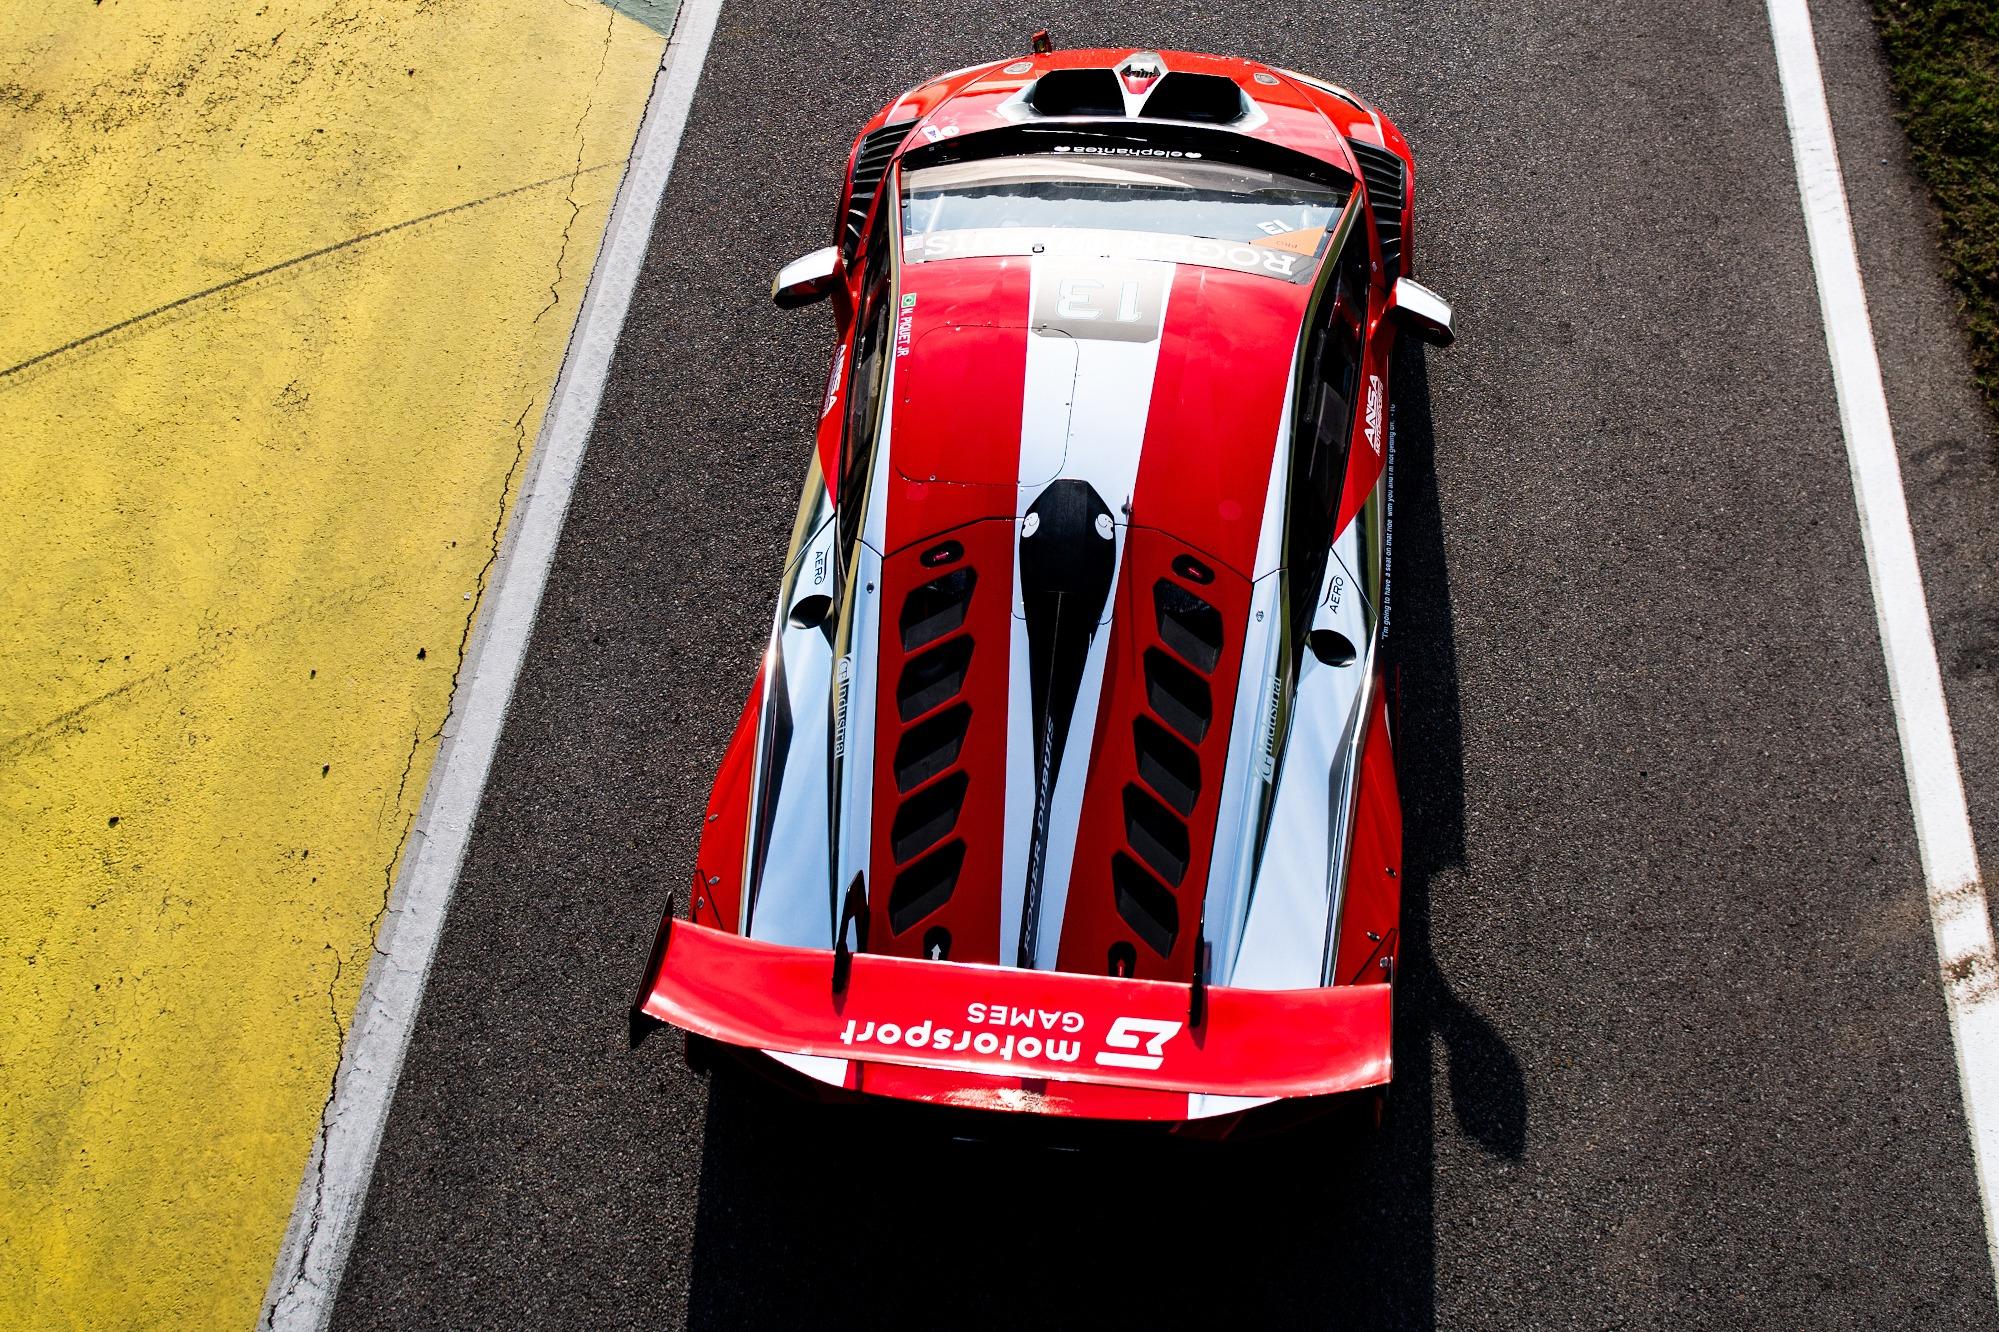 Piquet has taken on his latest challenge in one-make Lamborghini racing